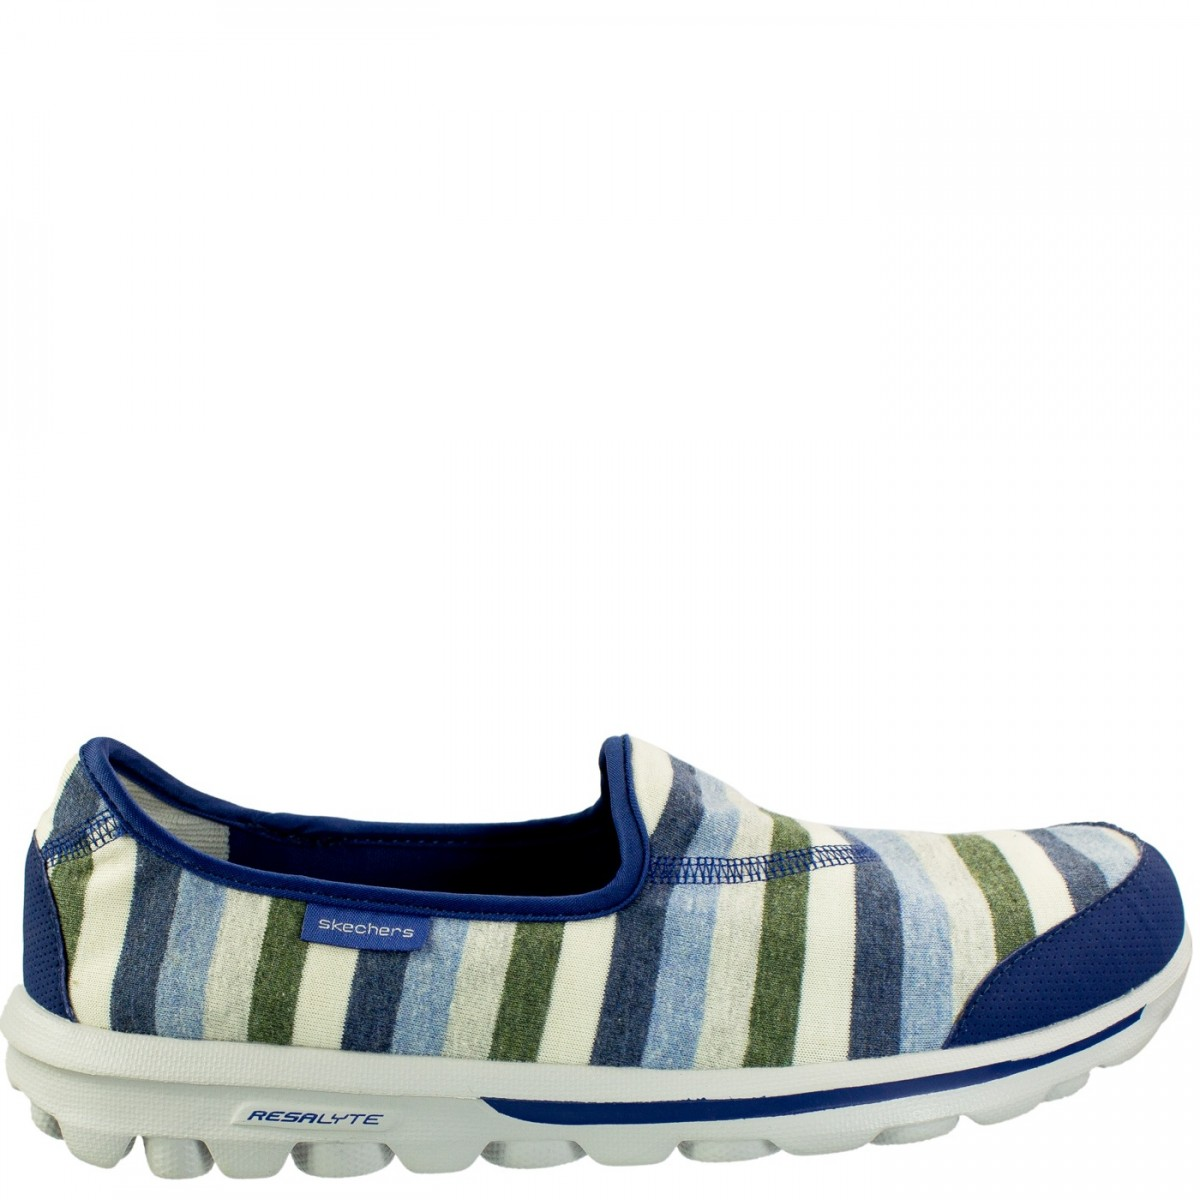 f02a6a0aef Bizz Store - Tênis Feminino Skechers GoWalk Stripy Azul Listrado